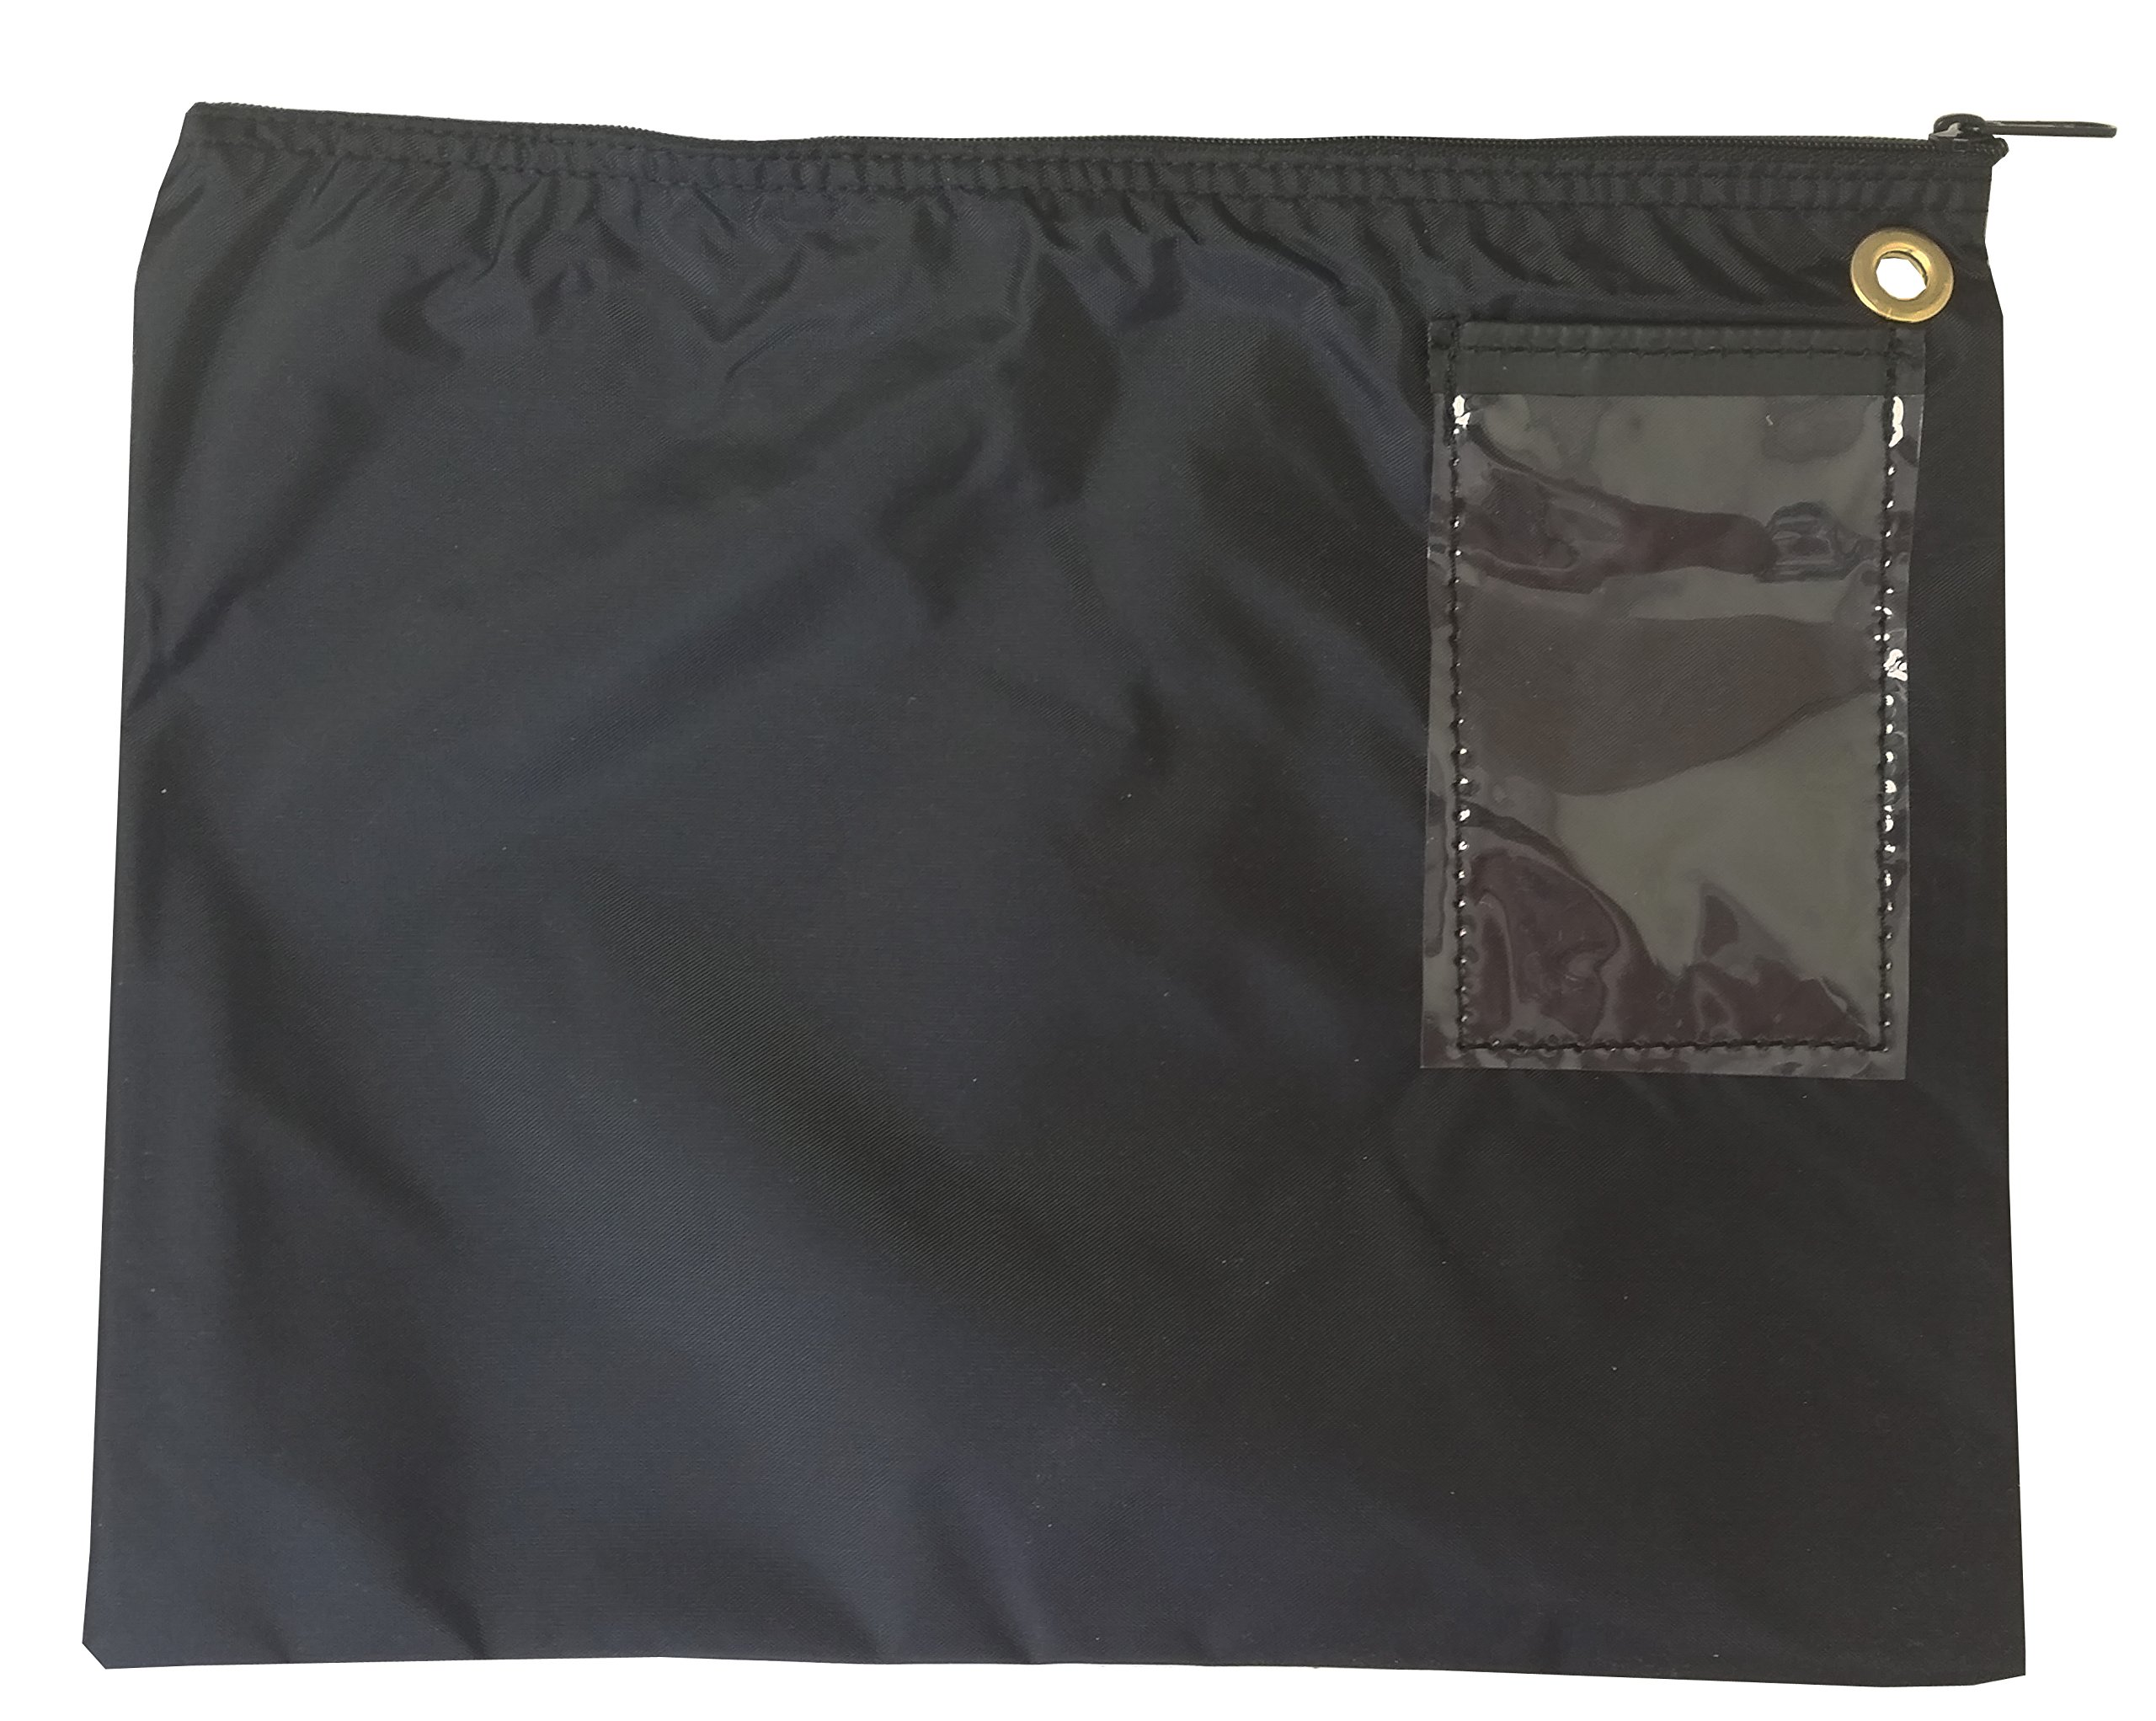 Interoffice Mailer 200 Denier Transit Sack Zipper Bag Black (18x14) by Cardinal bag supplies